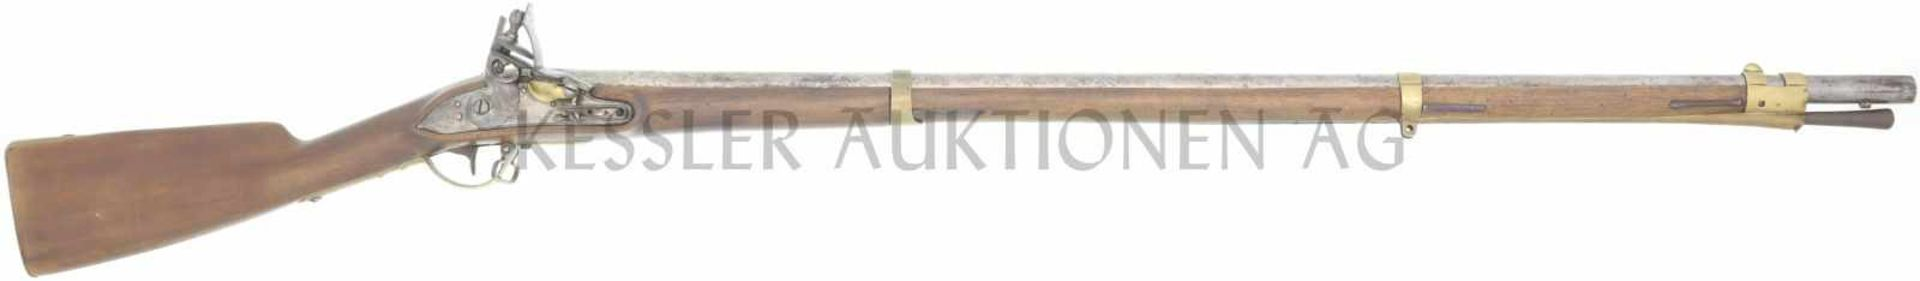 Steinschlossgewehr, 1777/1817, Kant. Thurgau, Kal. 17.6mm LL 1030mm, TL 1420mm, Rundlauf, flache